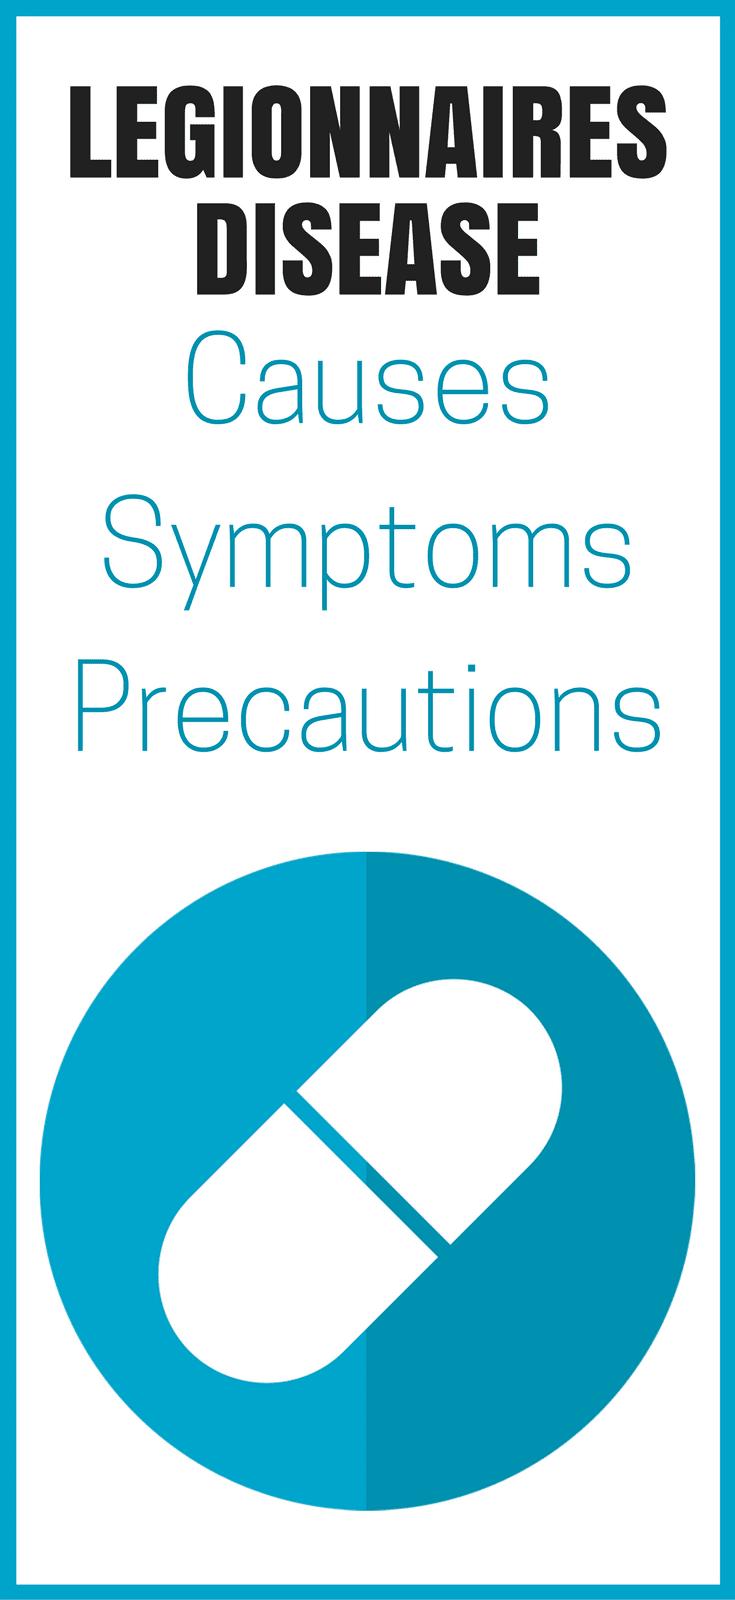 What is Legionnaires disease : Causes, Symptoms & Precautions